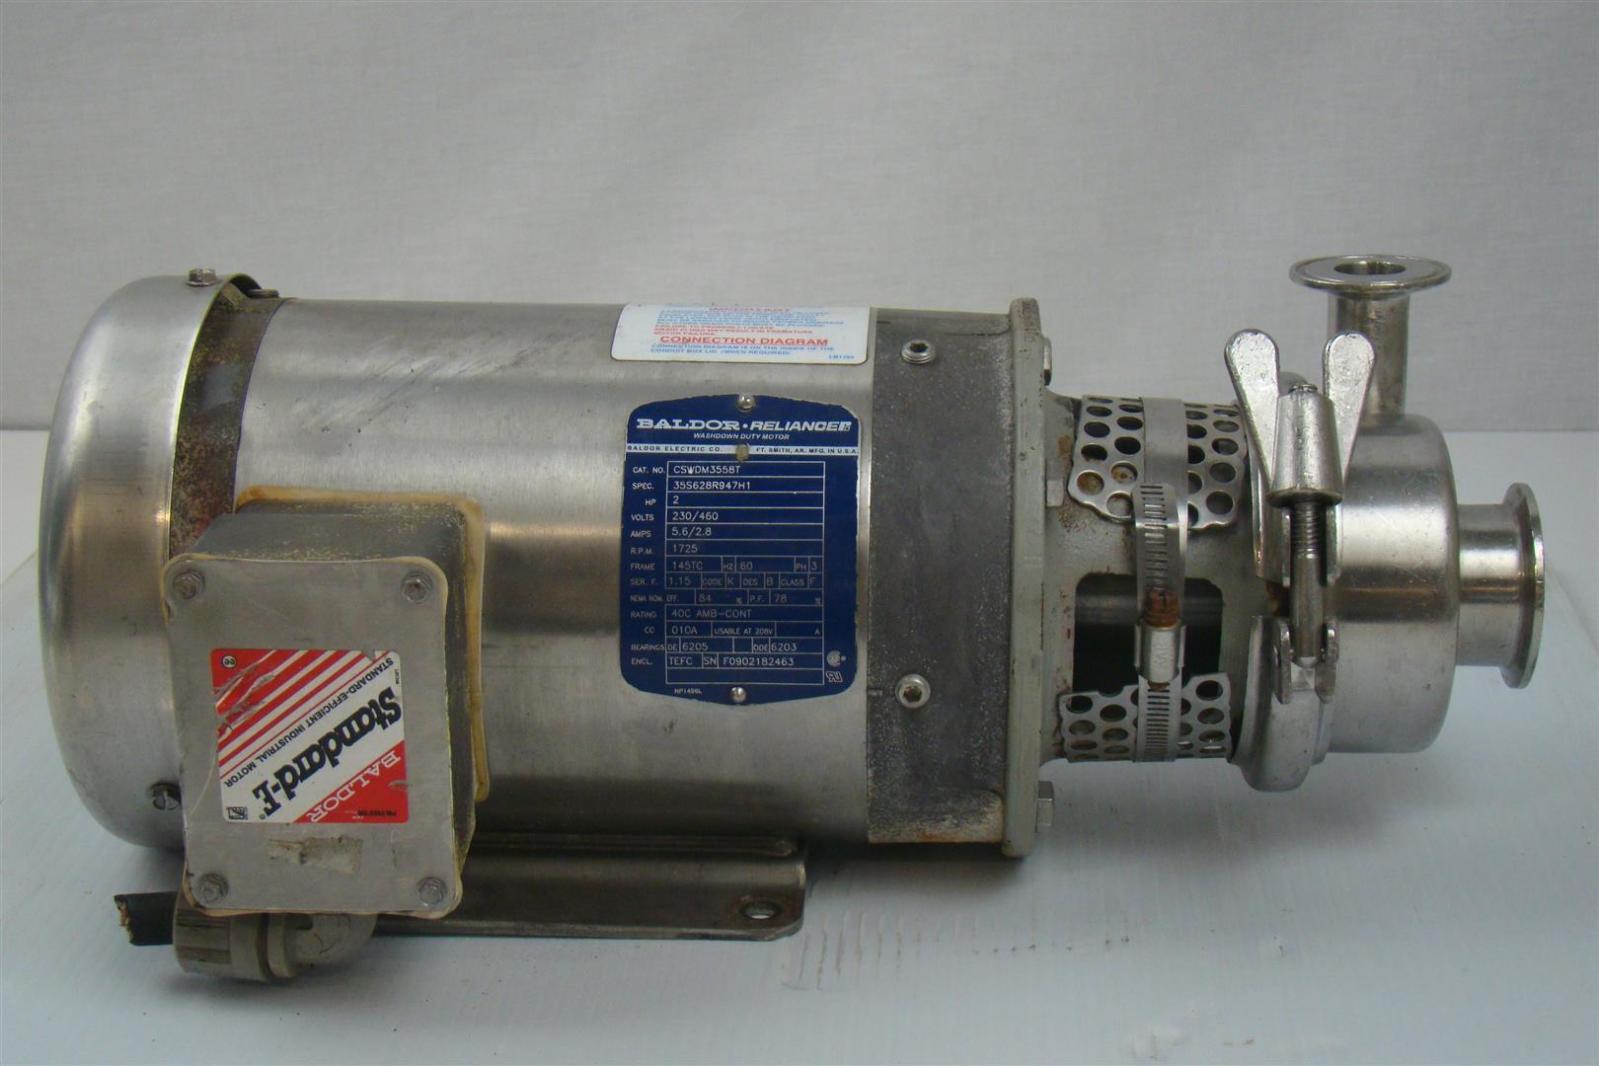 Baldor Motor 2hp 1725rpm 230 460v 5 6 2 8a 60hz 3phase